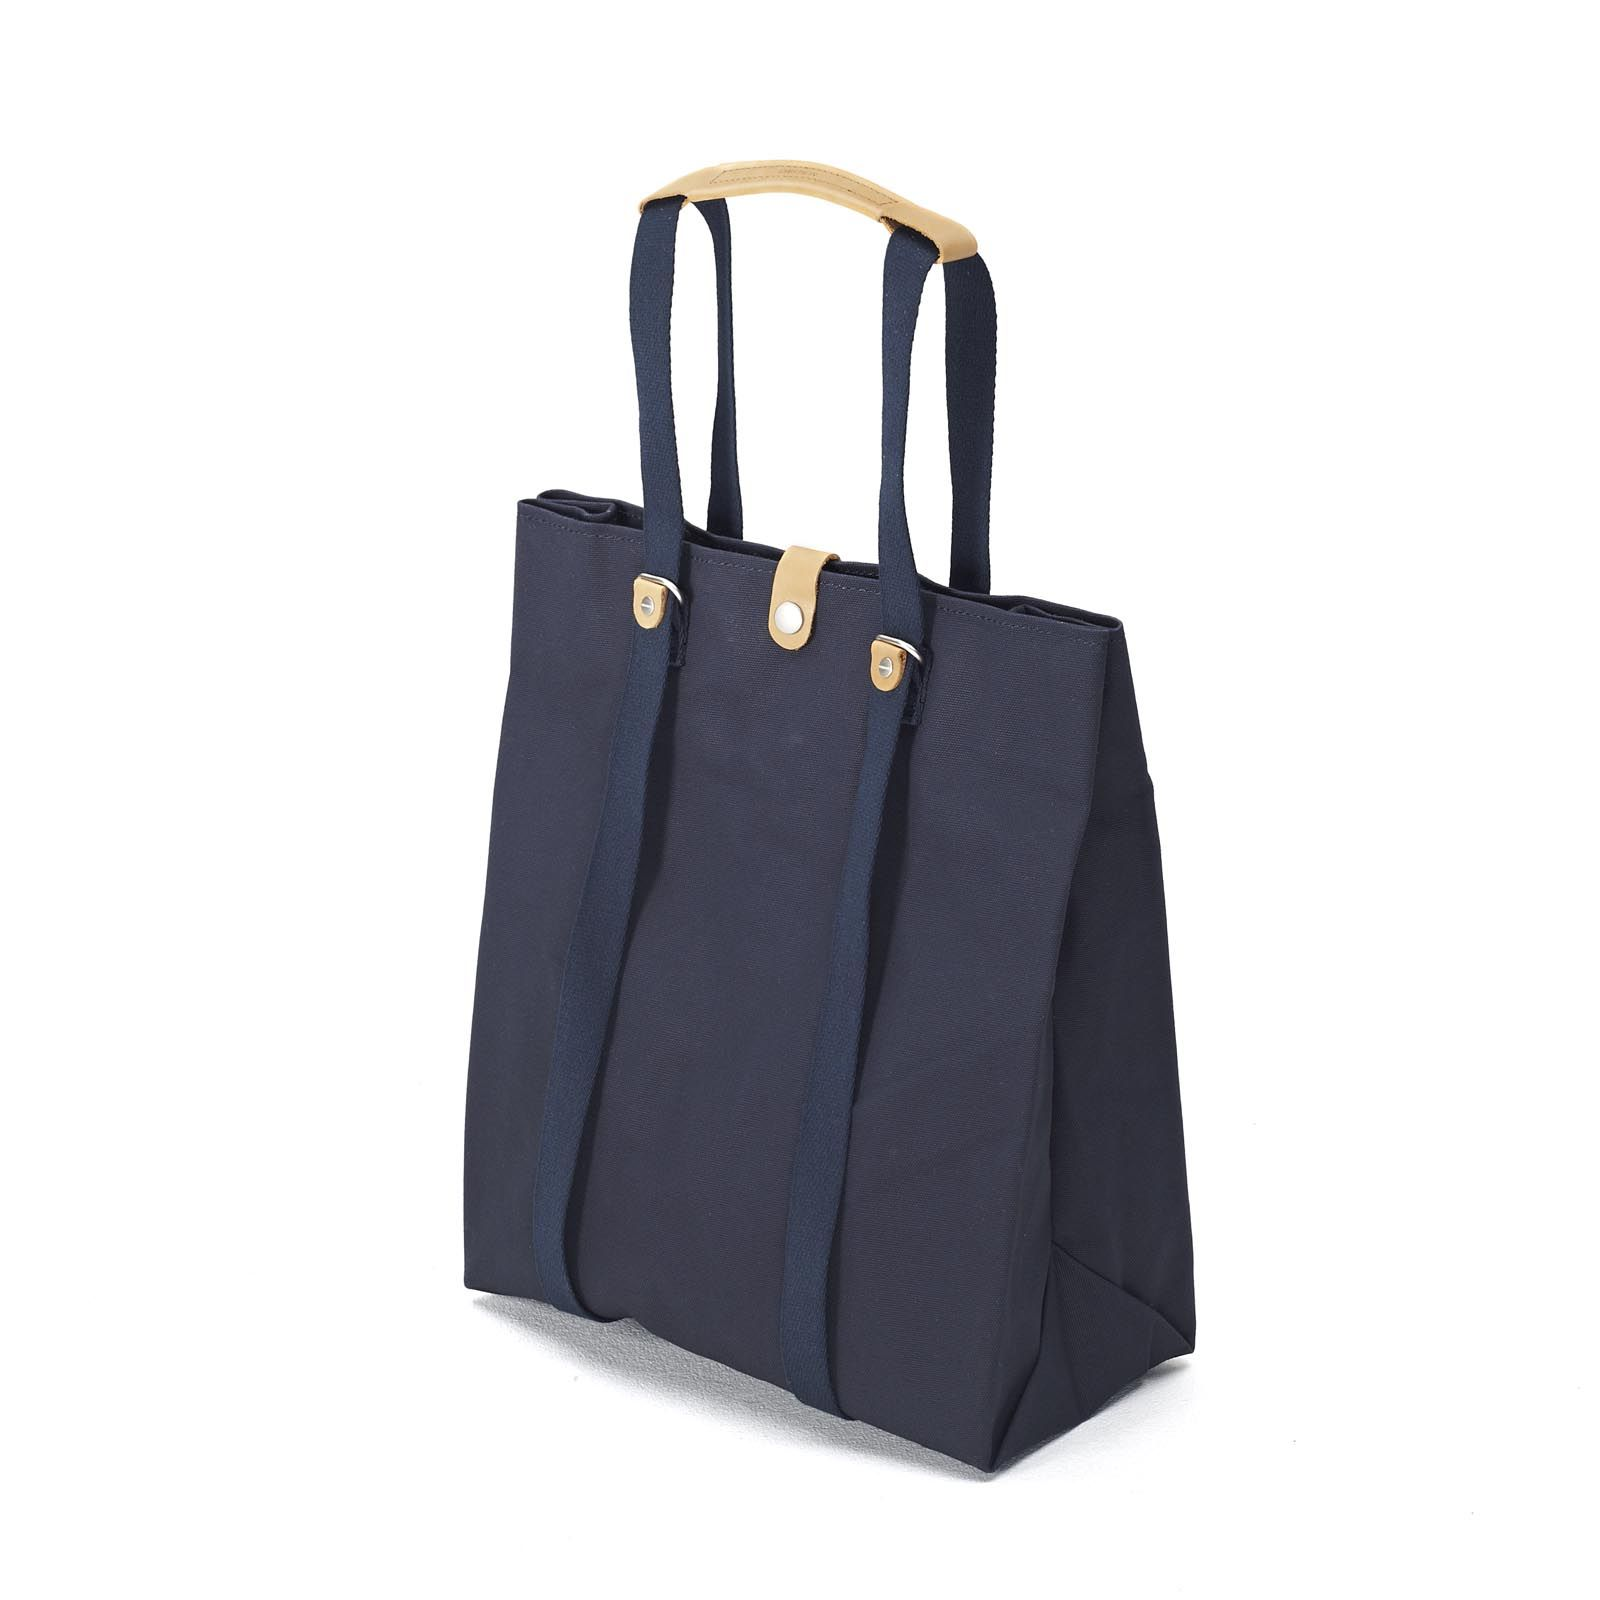 Shopper - Organic Navy